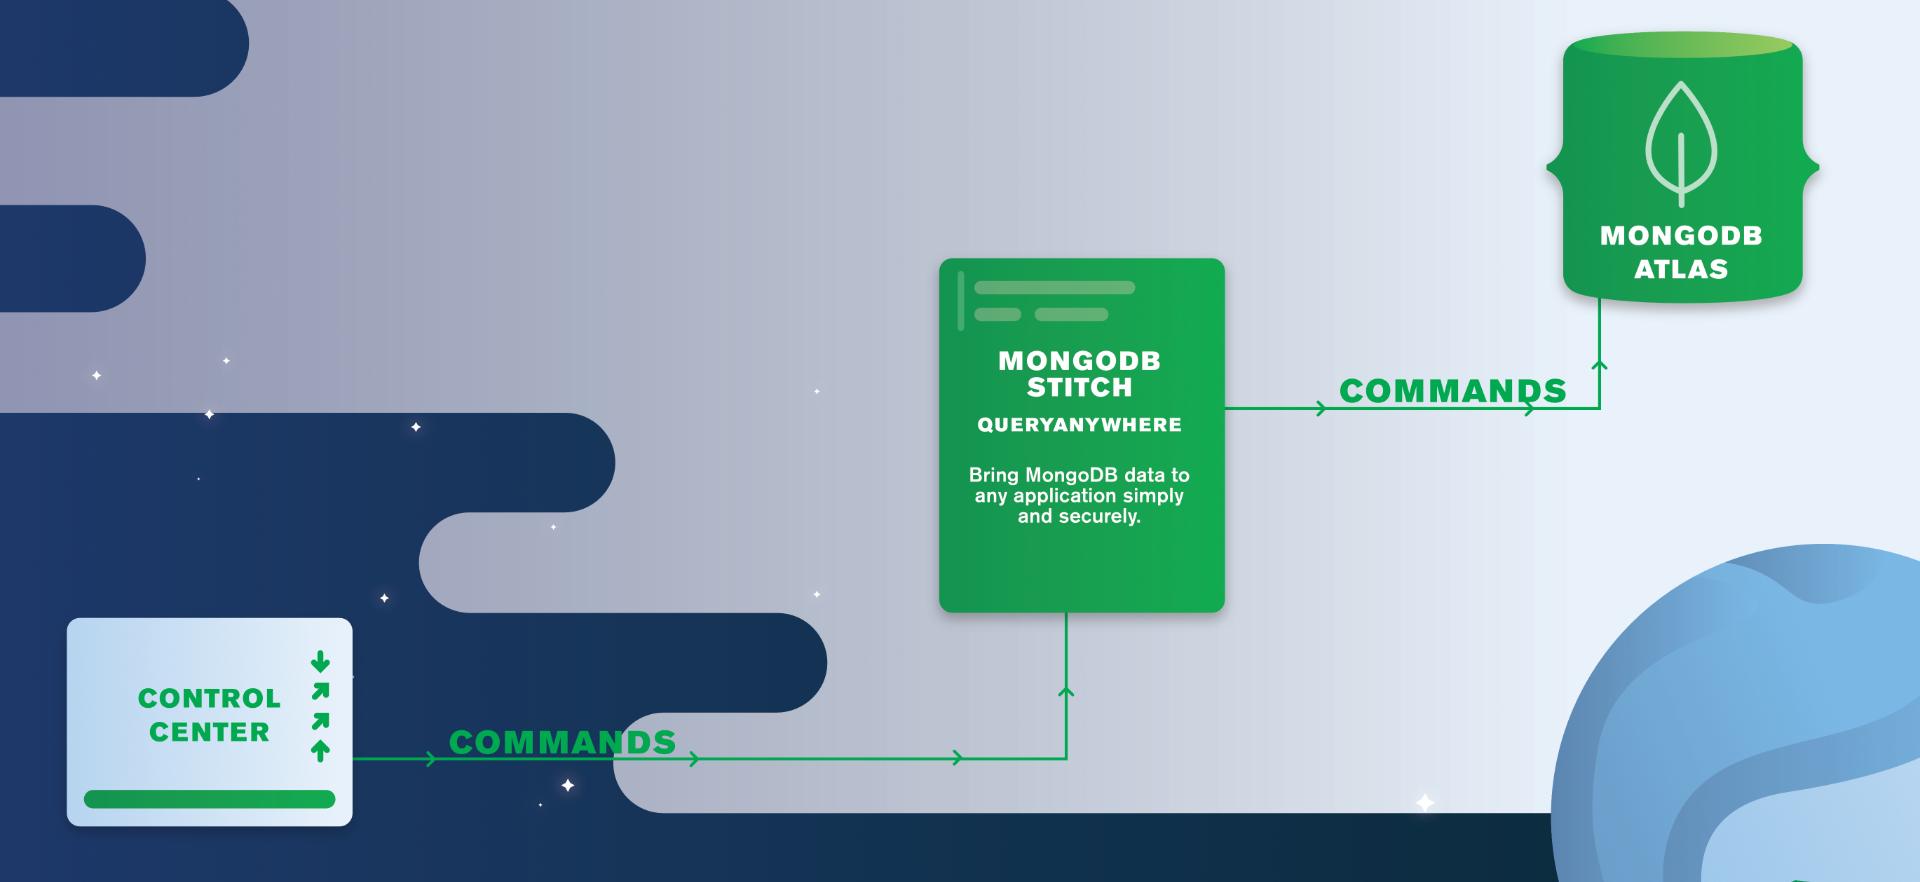 MongoDB Stitch QueryAnywhere